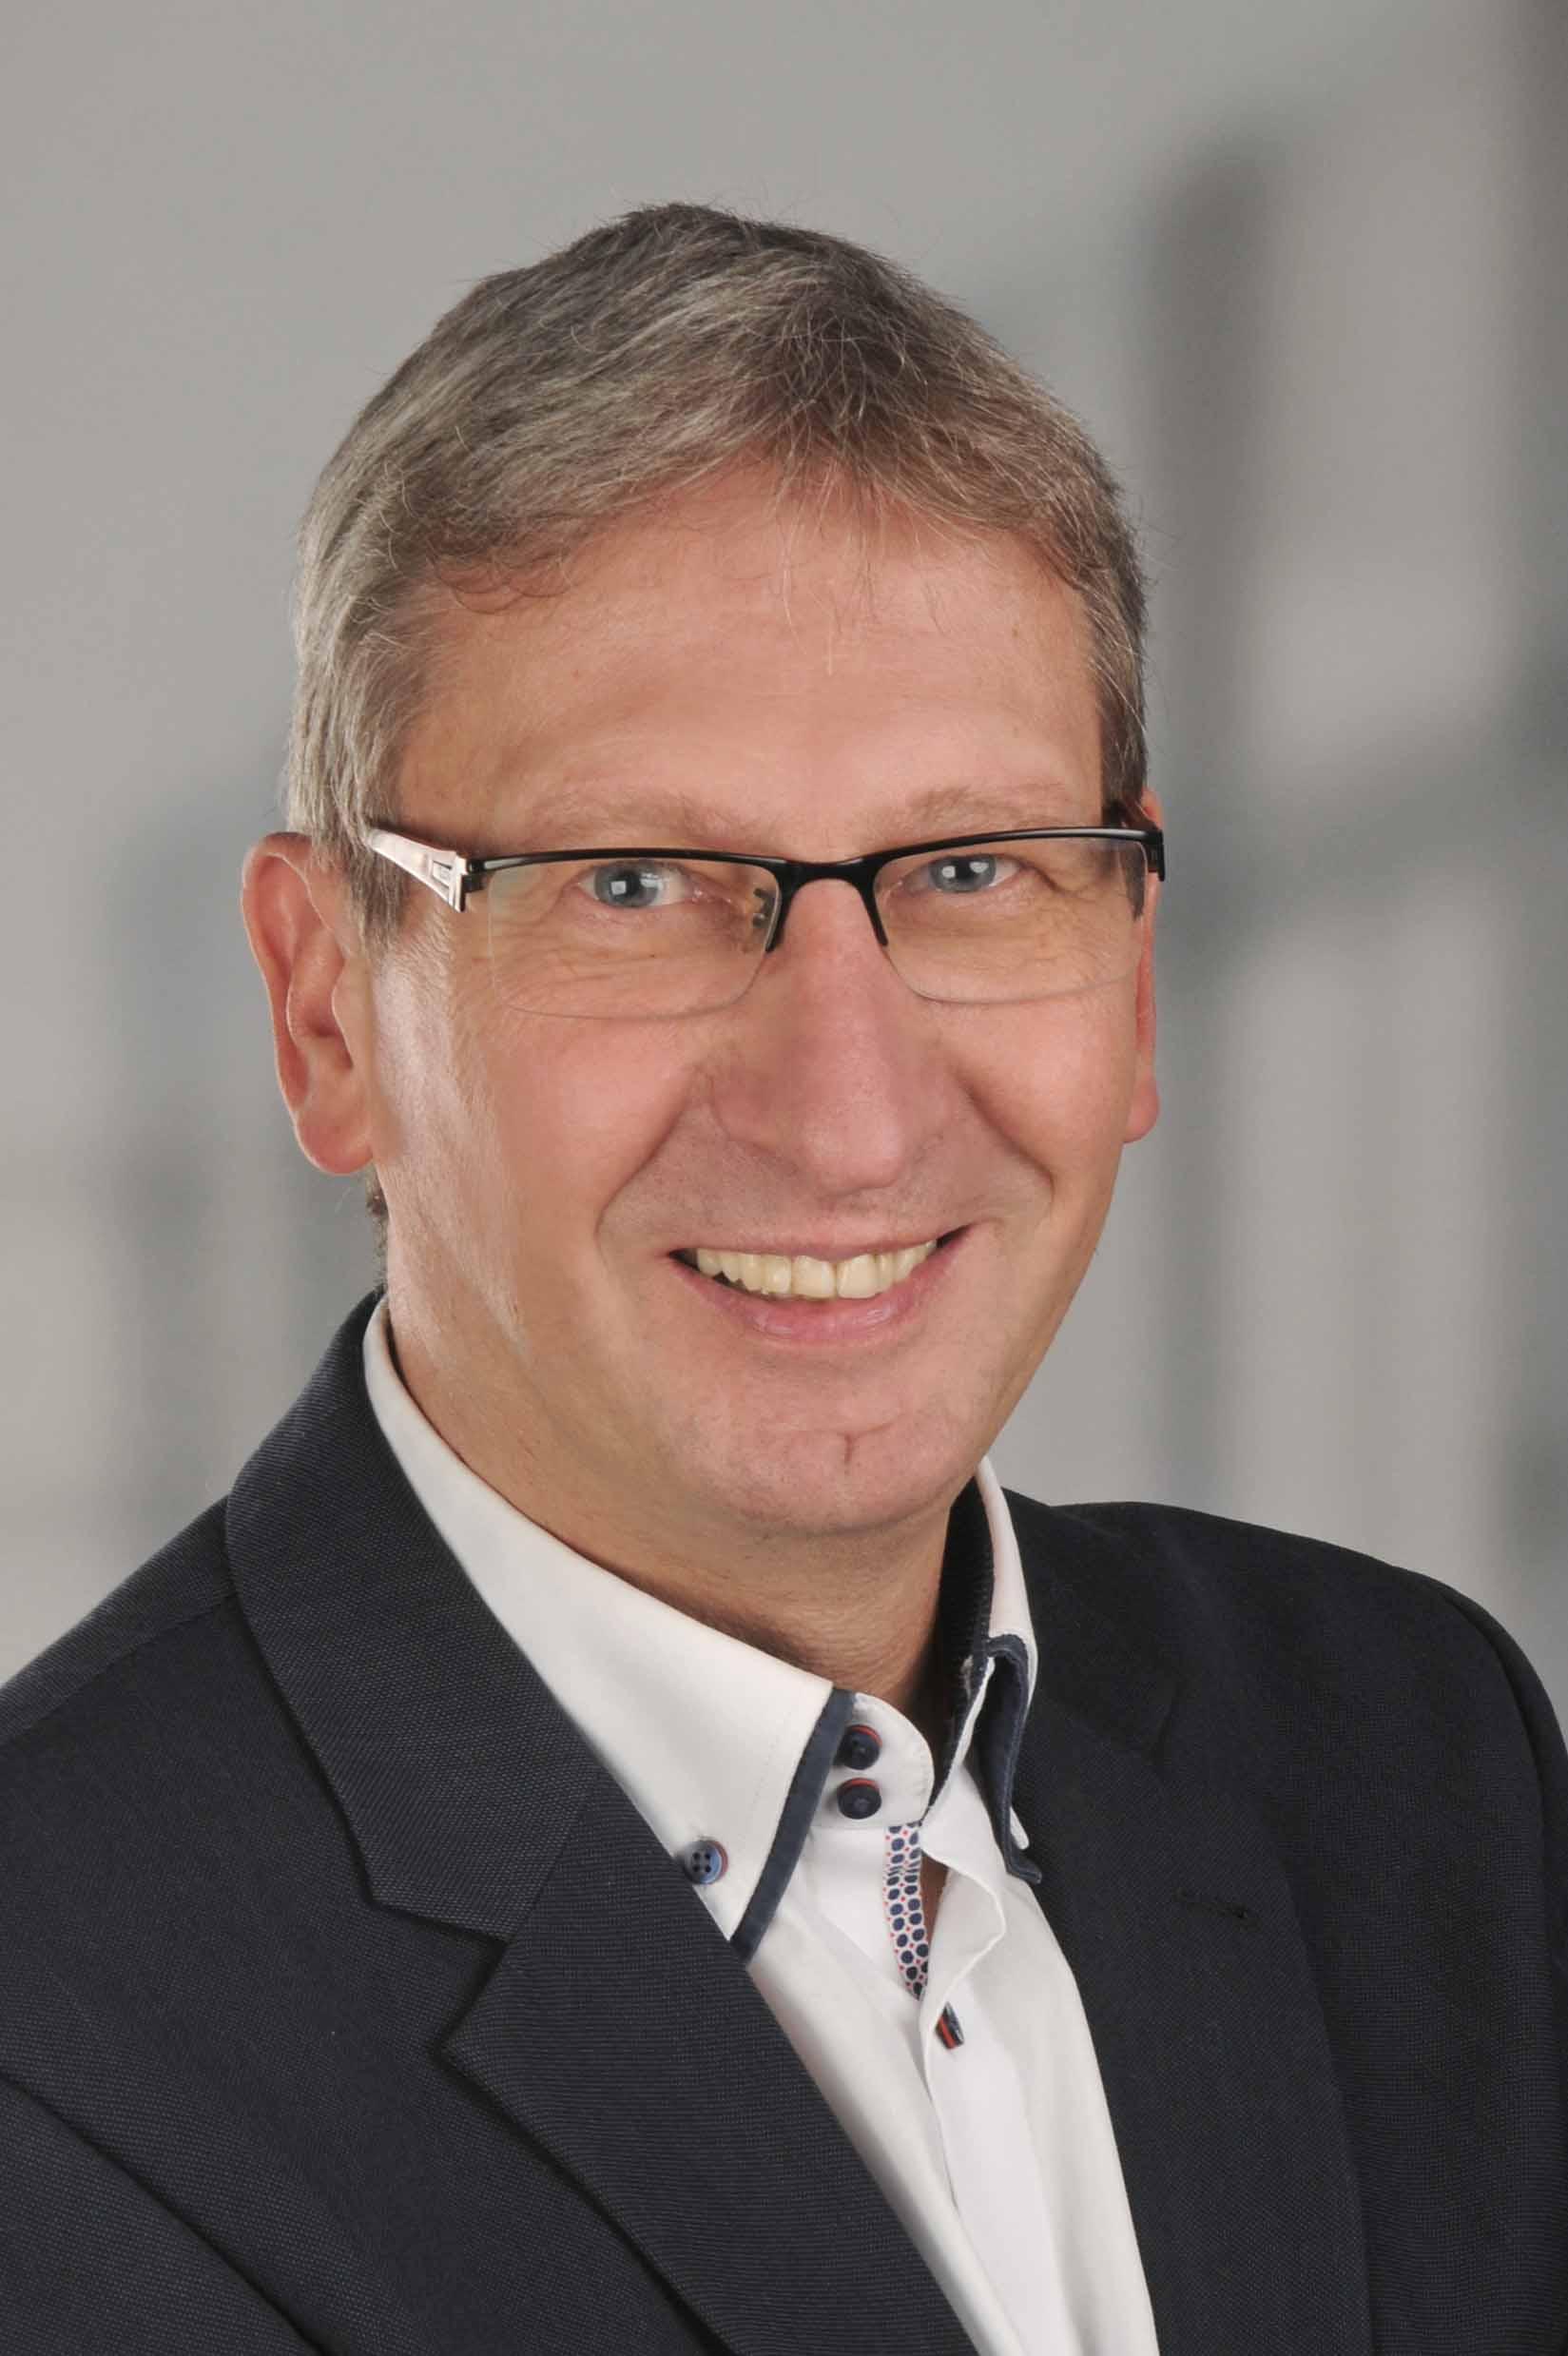 Hans-Günter Schmidts